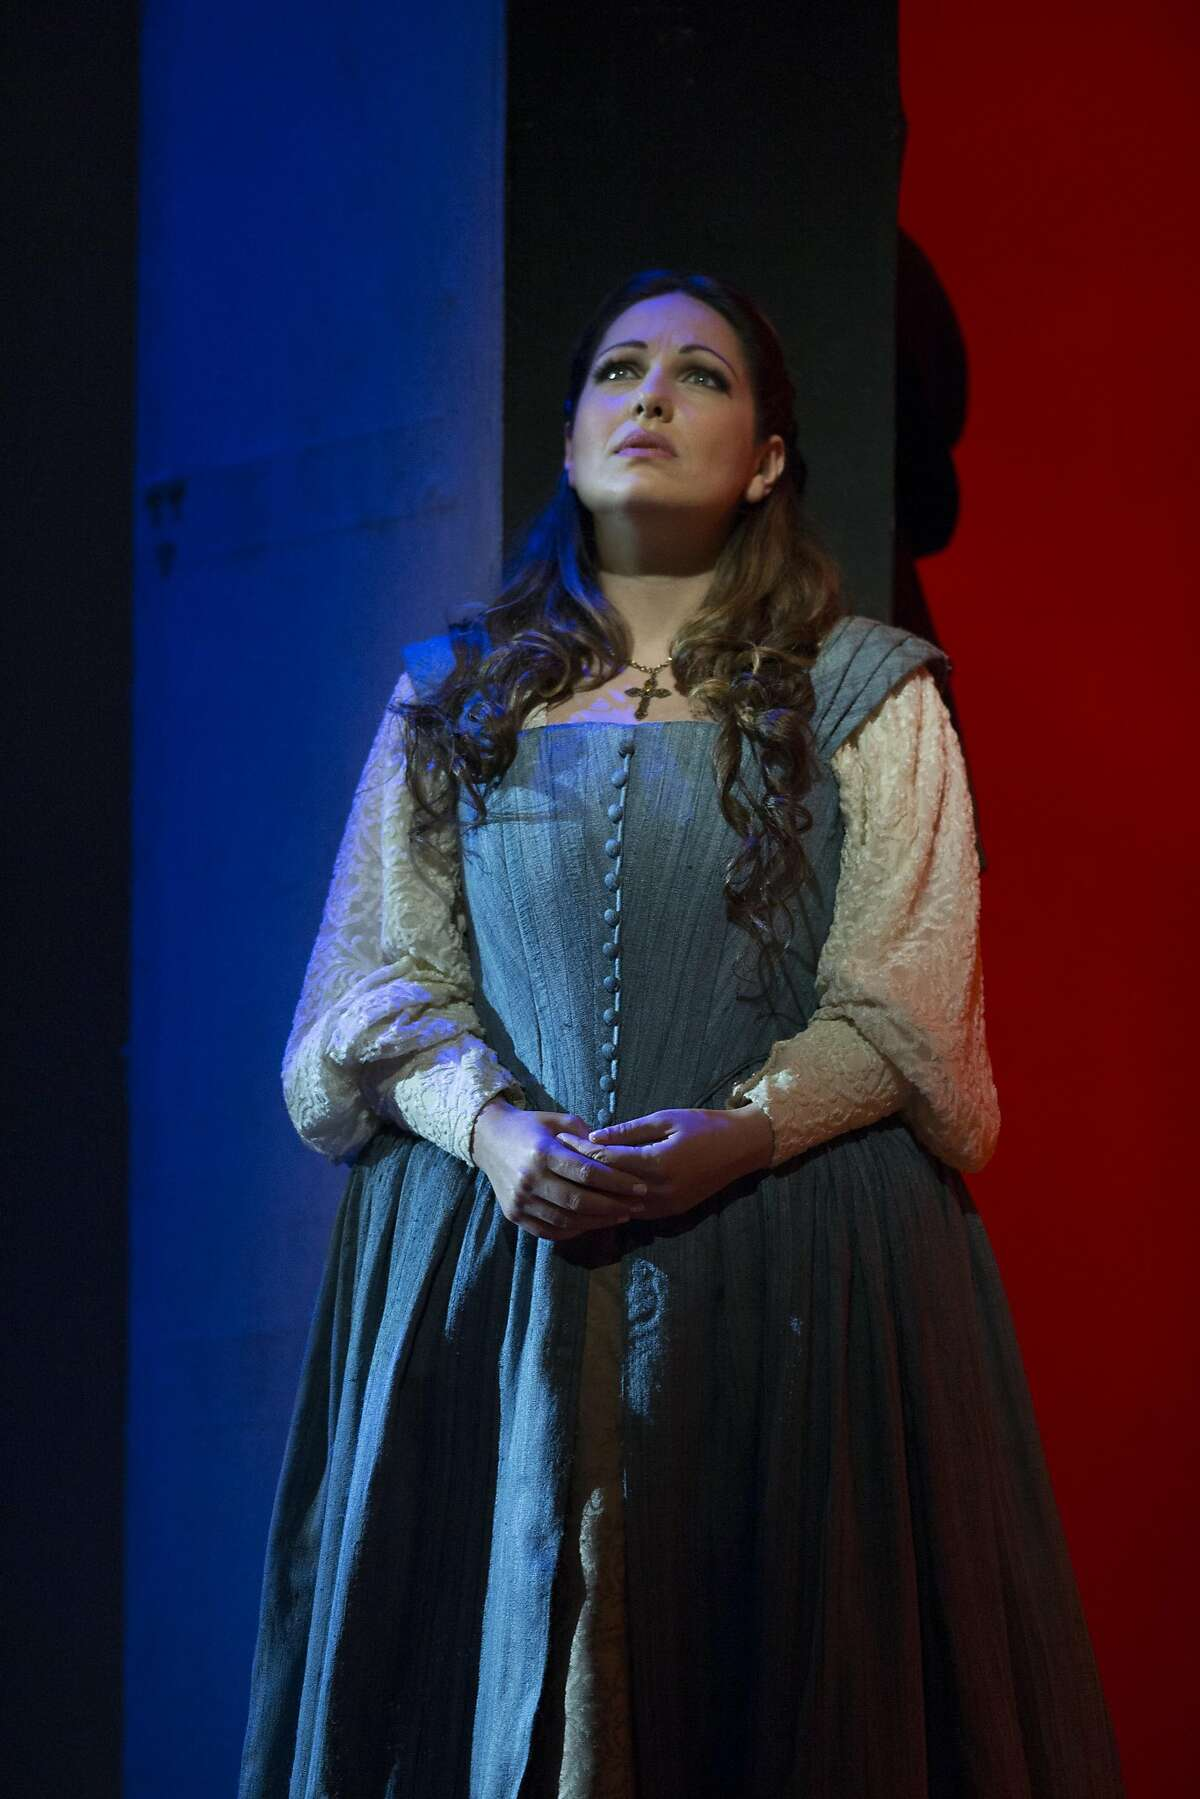 "Nino Machaidze as Gilda, in a scene from San Francisco Opera's production of Giuseppe Verdi's ""Rigoletto,"" Saturday, May 27, 2017, at the War Memorial Opera House in San Francisco, Calif."